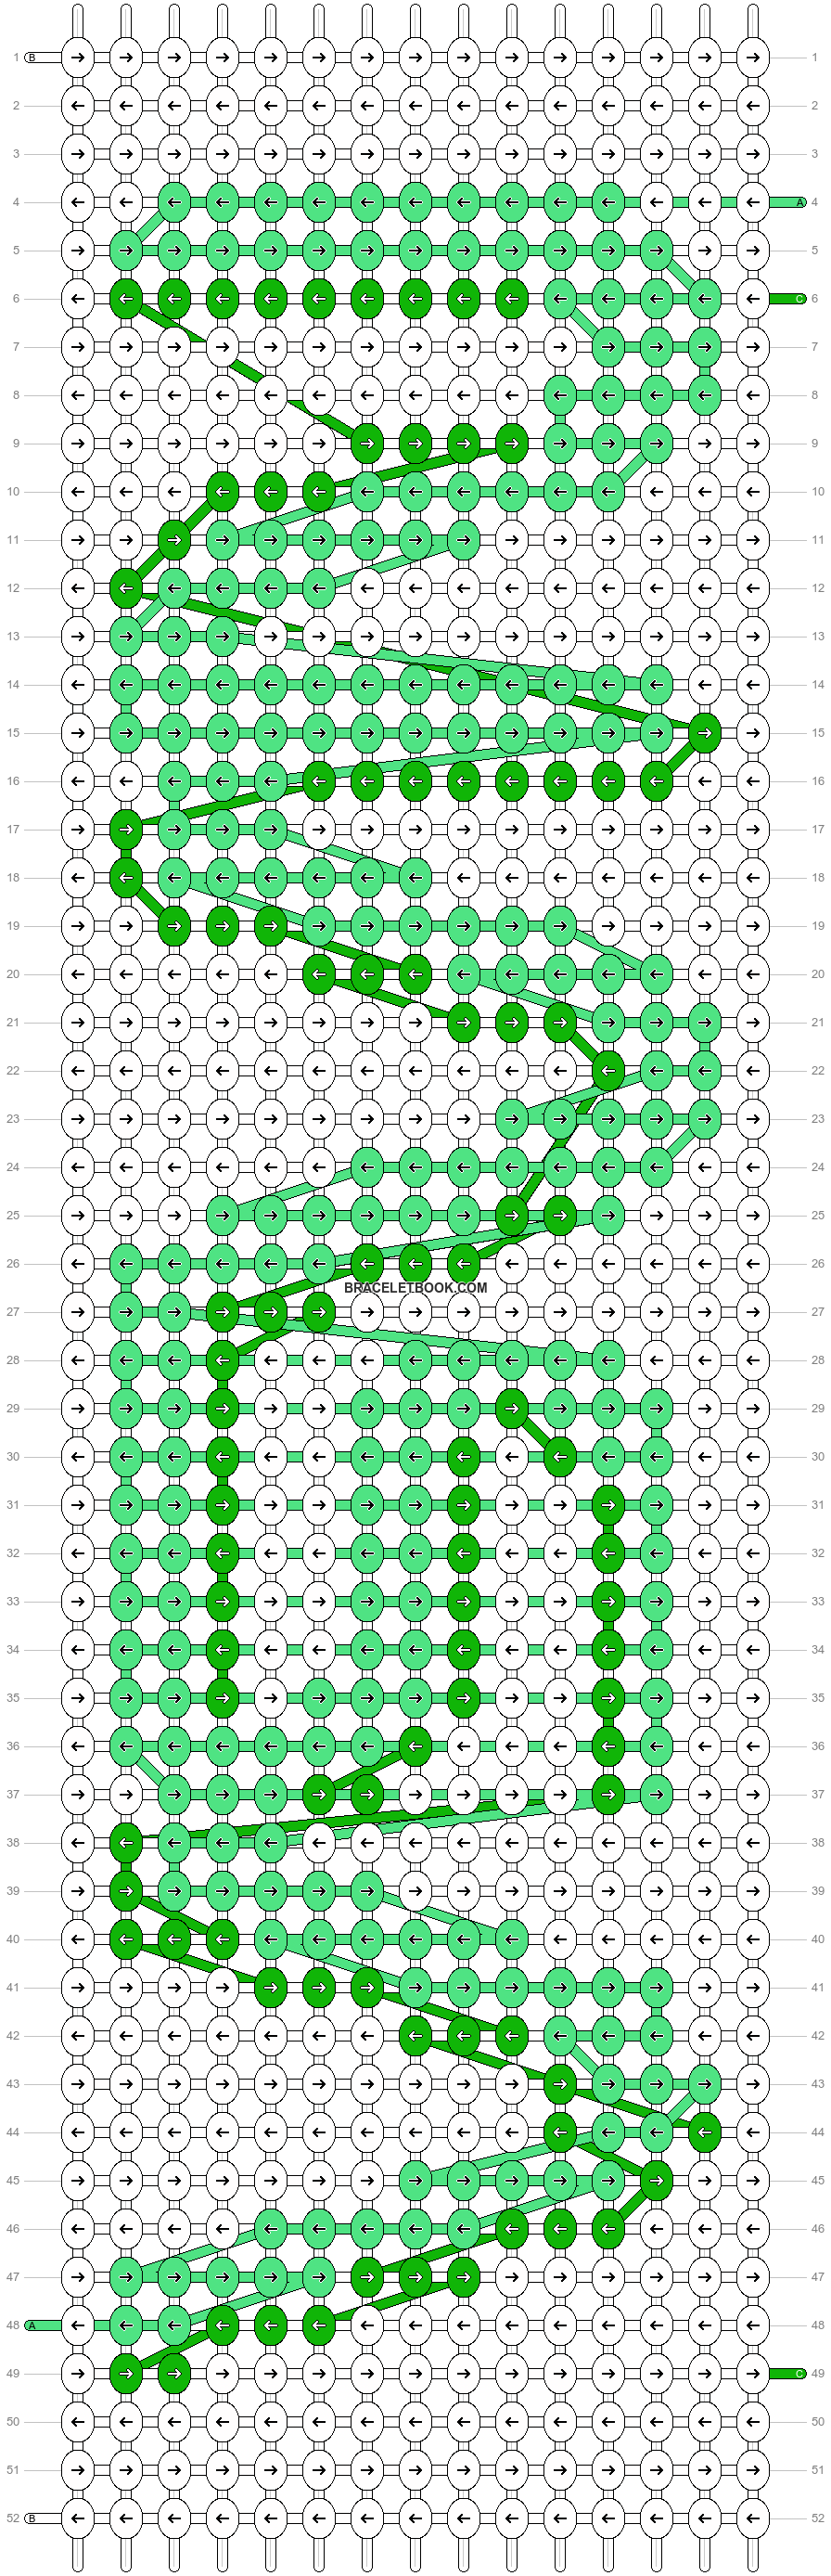 Alpha pattern #57624 variation #101106 pattern